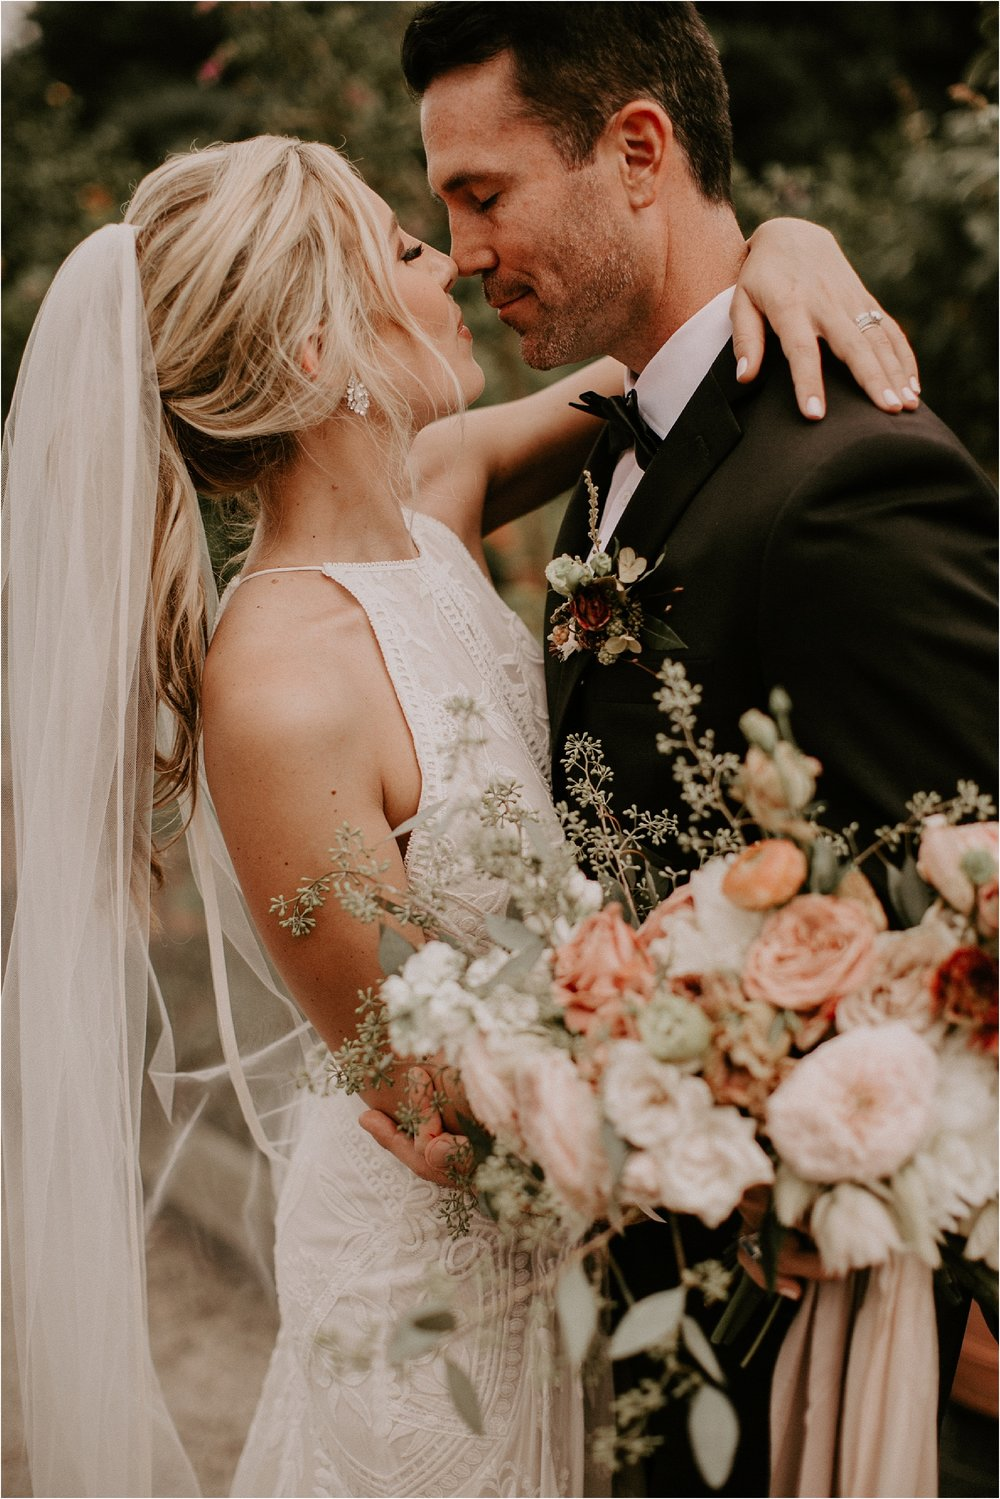 Sarah_Brookhart_Hortulus_Farm_Garden_and_Nursey_Wedding_Photographer_0053.jpg